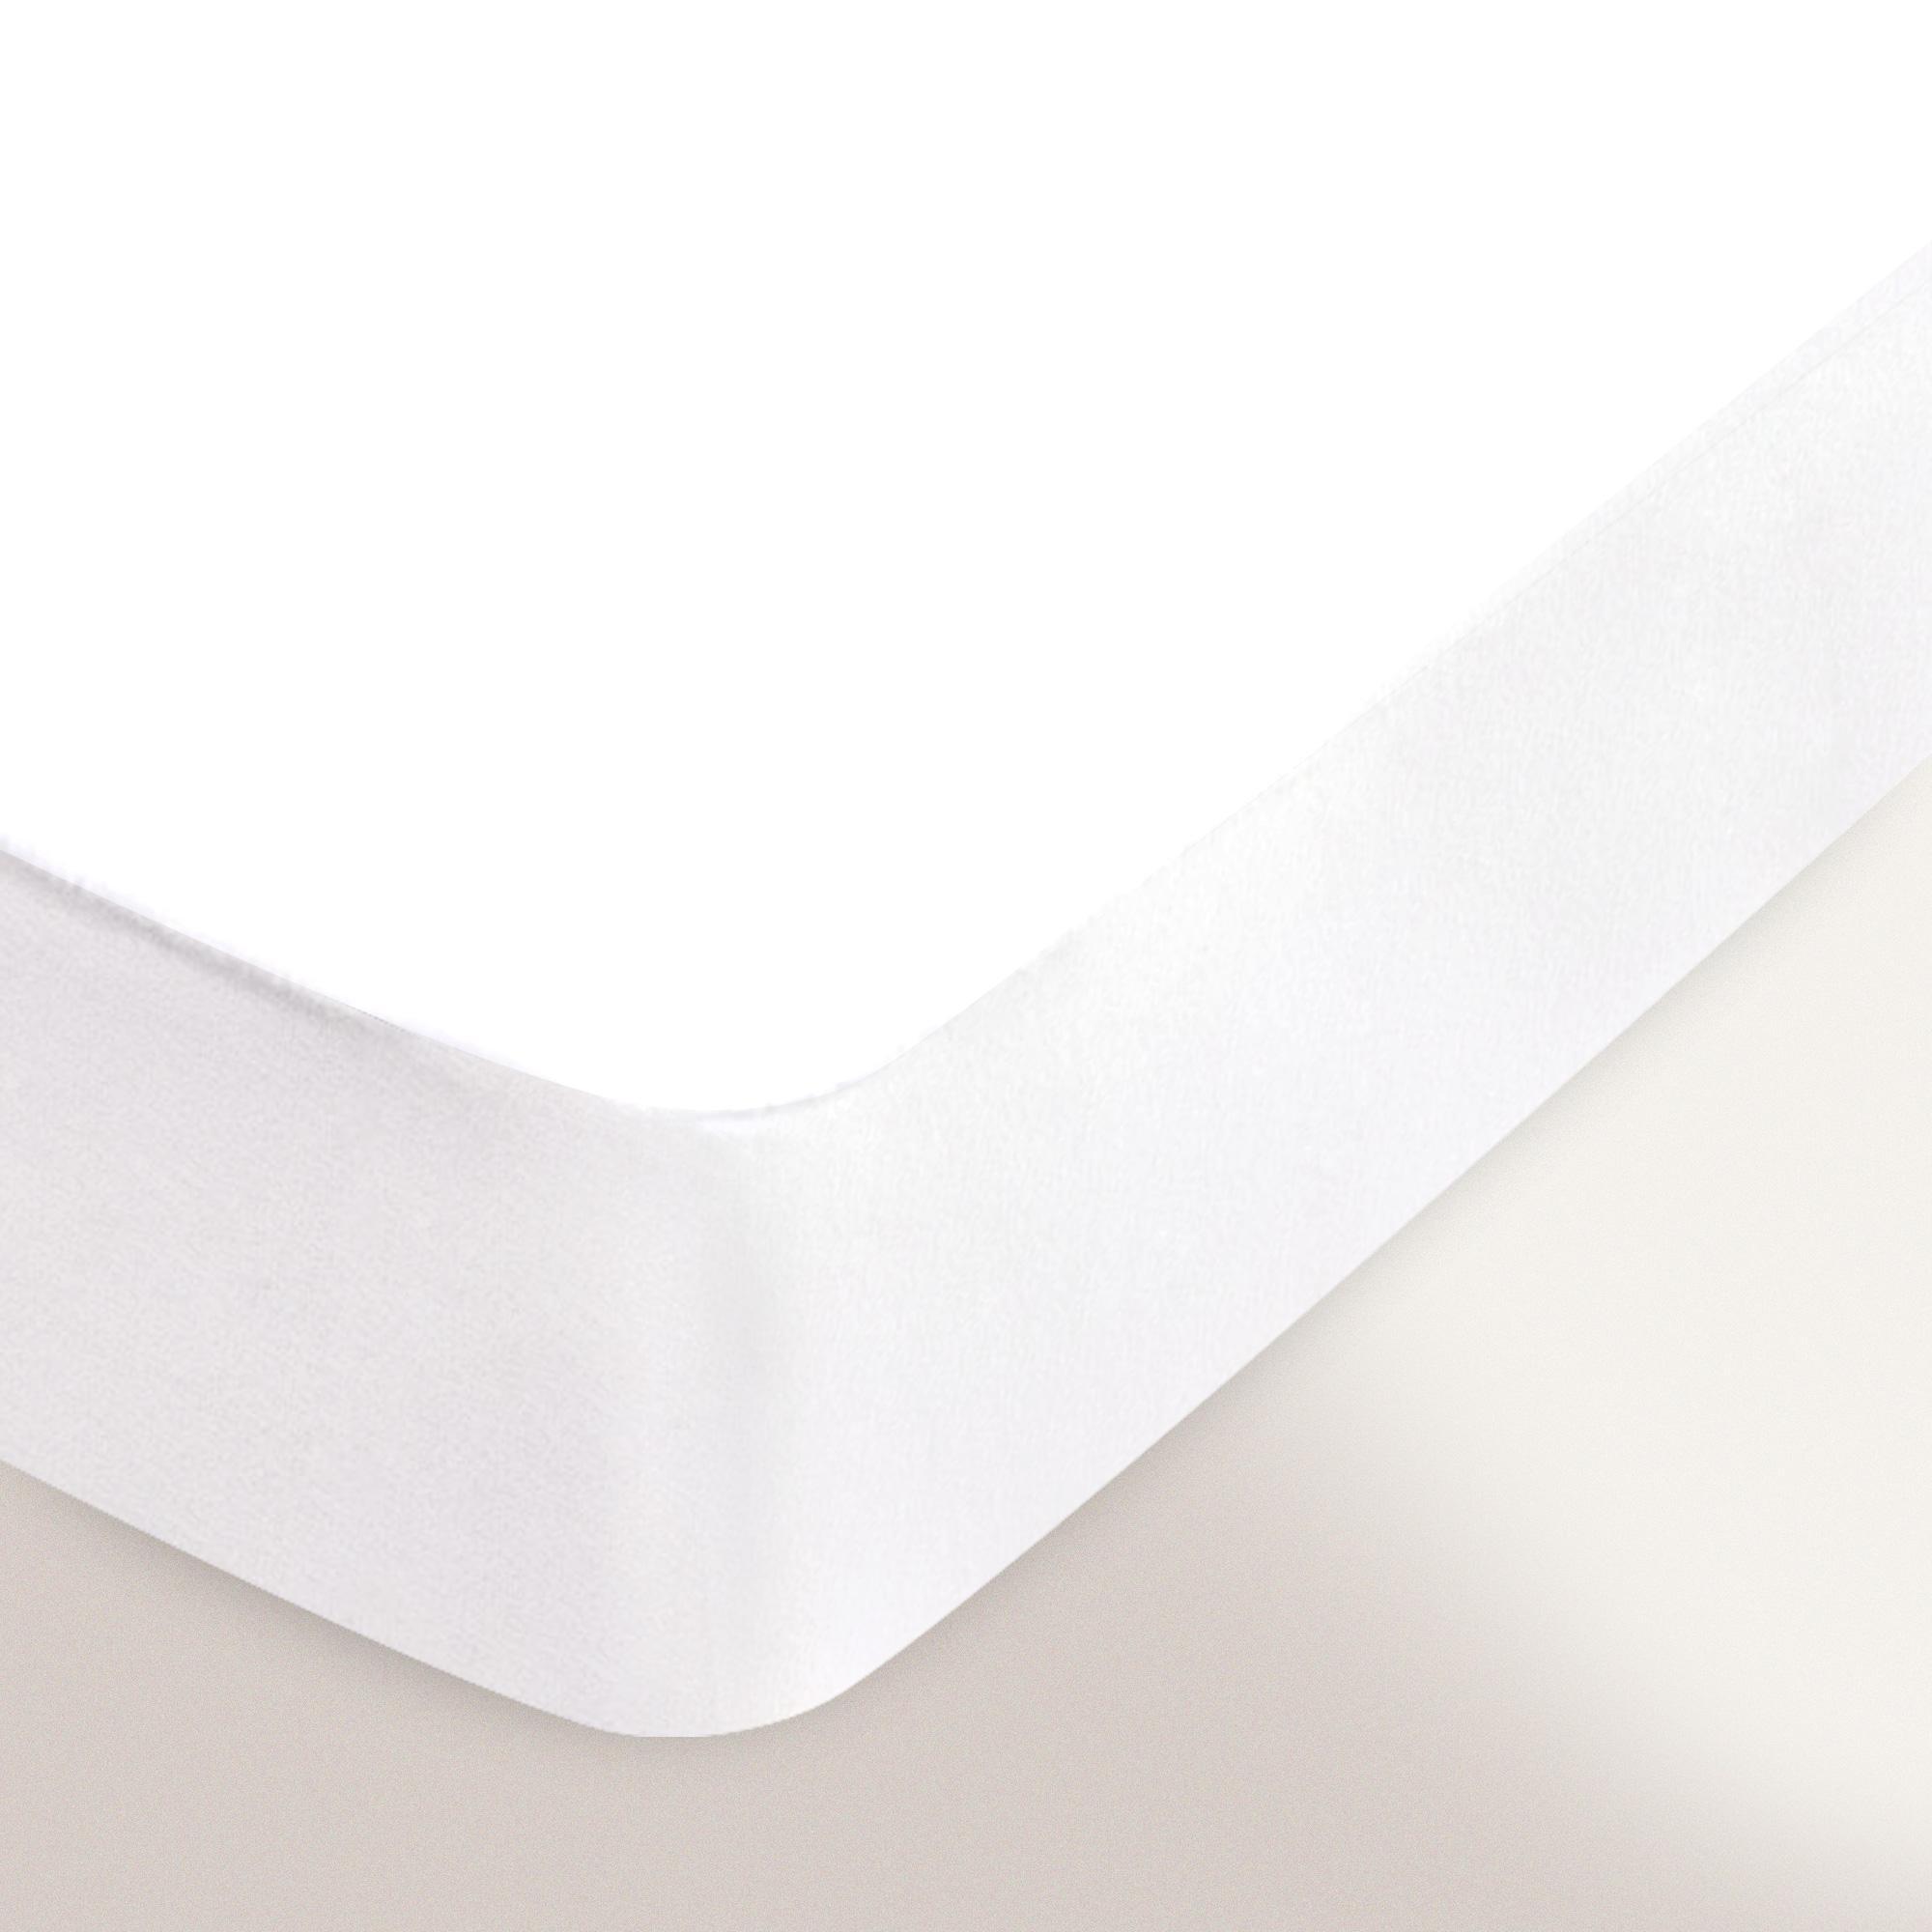 prot ge matelas imperm able antony blanc 2x80x200 sp cial lit articul tr linnea linge. Black Bedroom Furniture Sets. Home Design Ideas